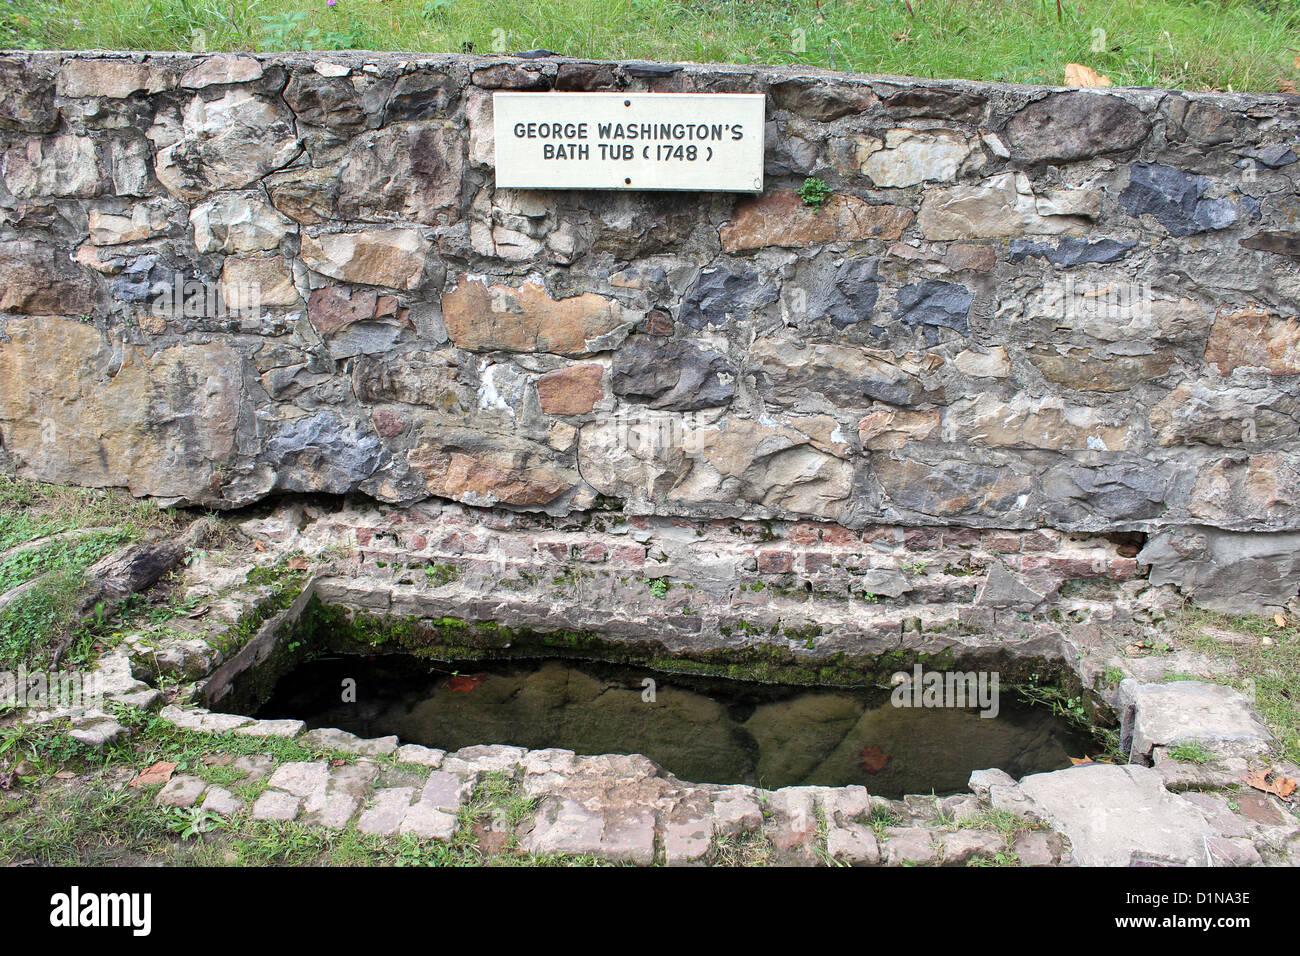 Vasca Da Bagno Usato : Berkeley springs spa vasca da bagno come usato da george